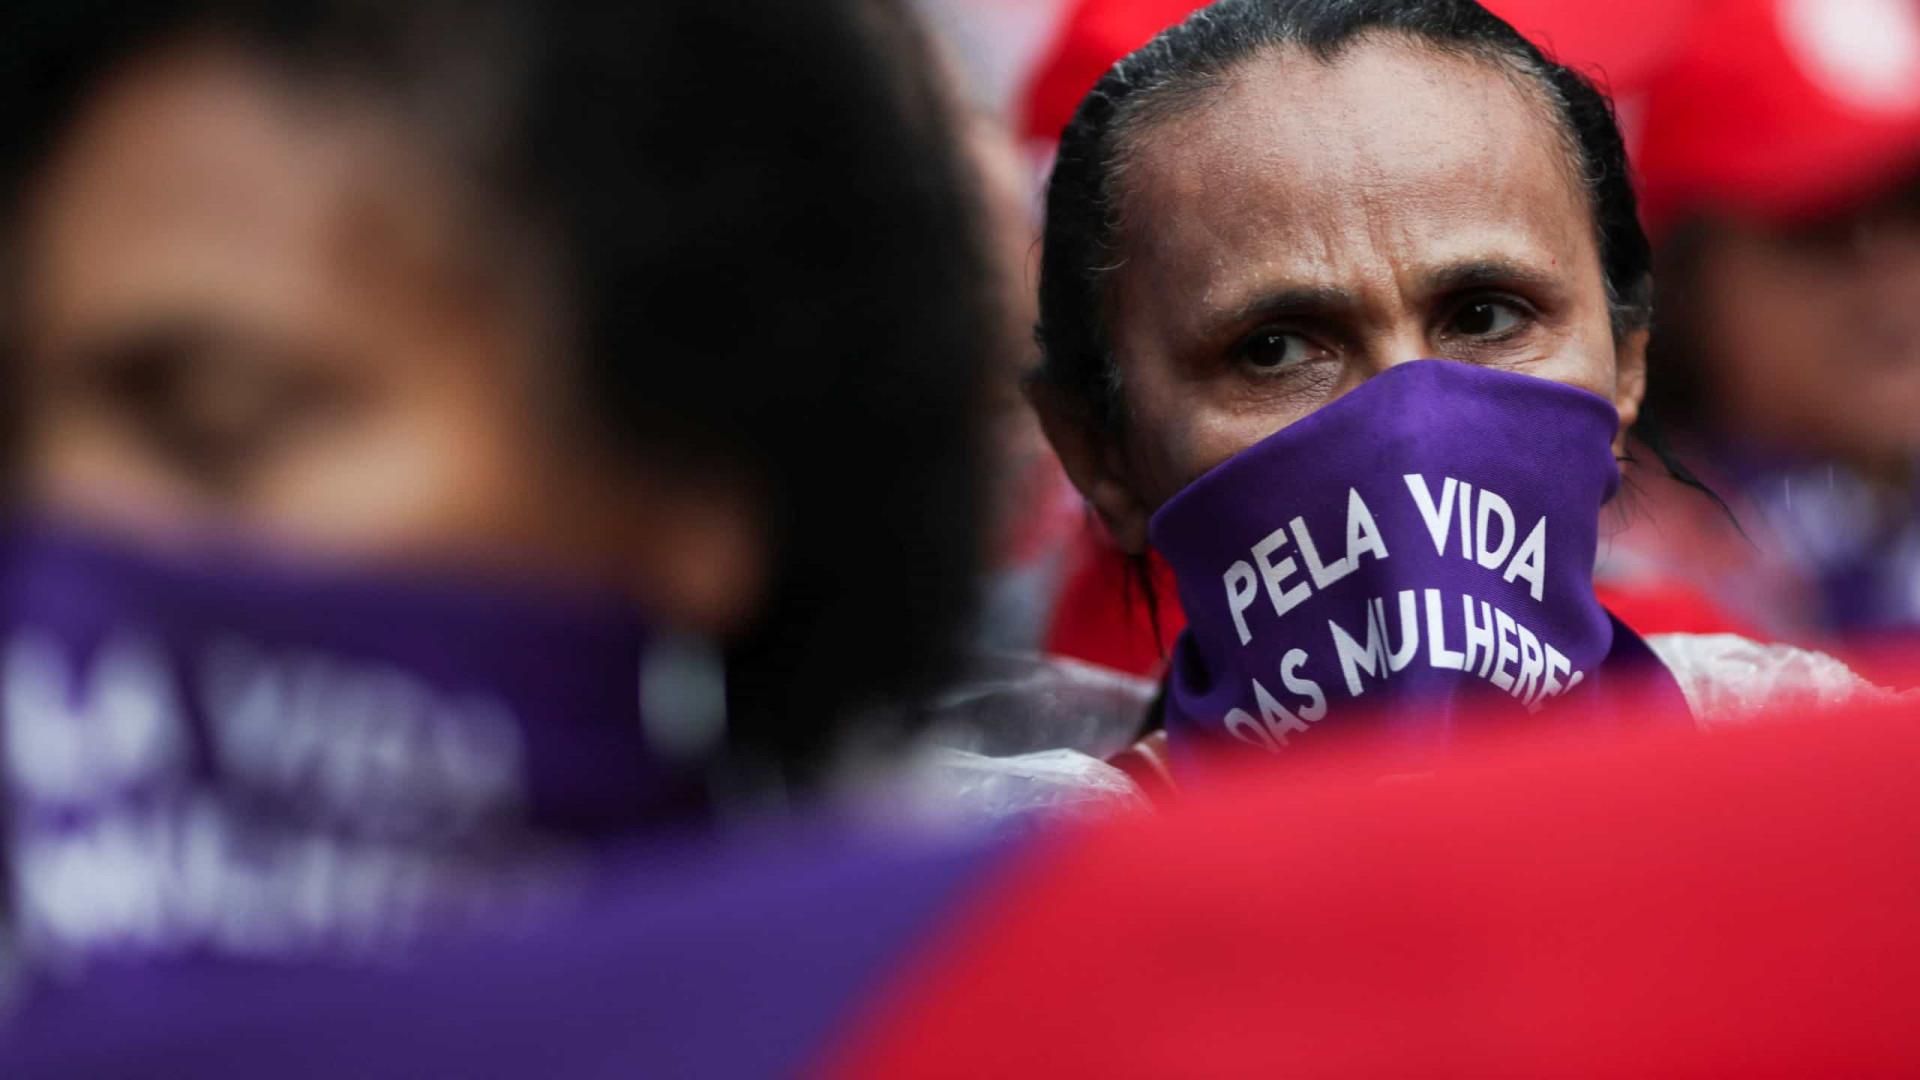 Em protestos pelo país, mulheres repudiam Bolsonaro